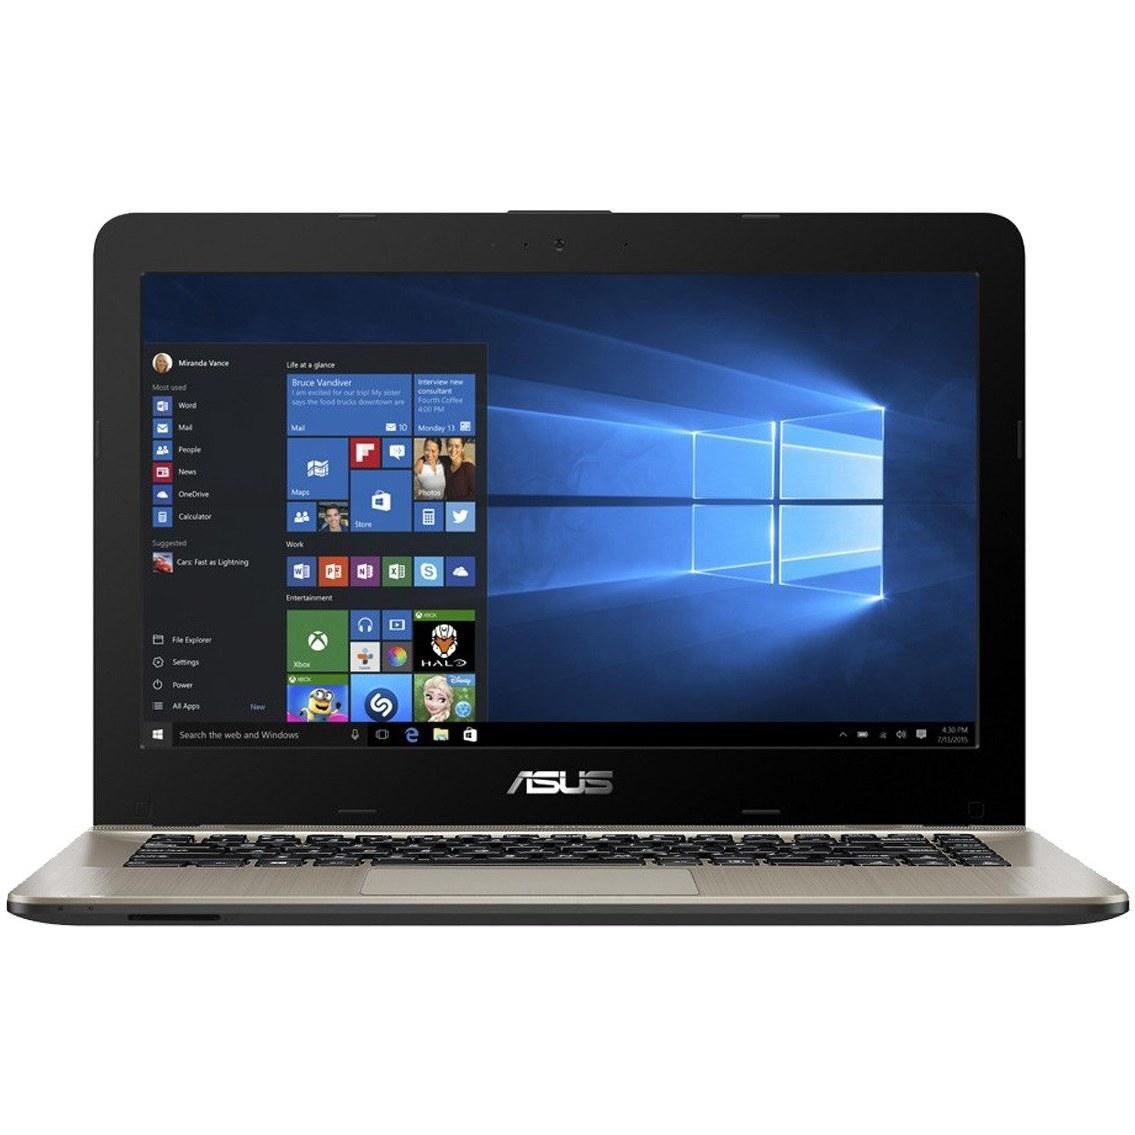 لپ تاپ ایسوس  ASUS X441UV Core i7 8GB 2TB 2GB Full HD Laptop